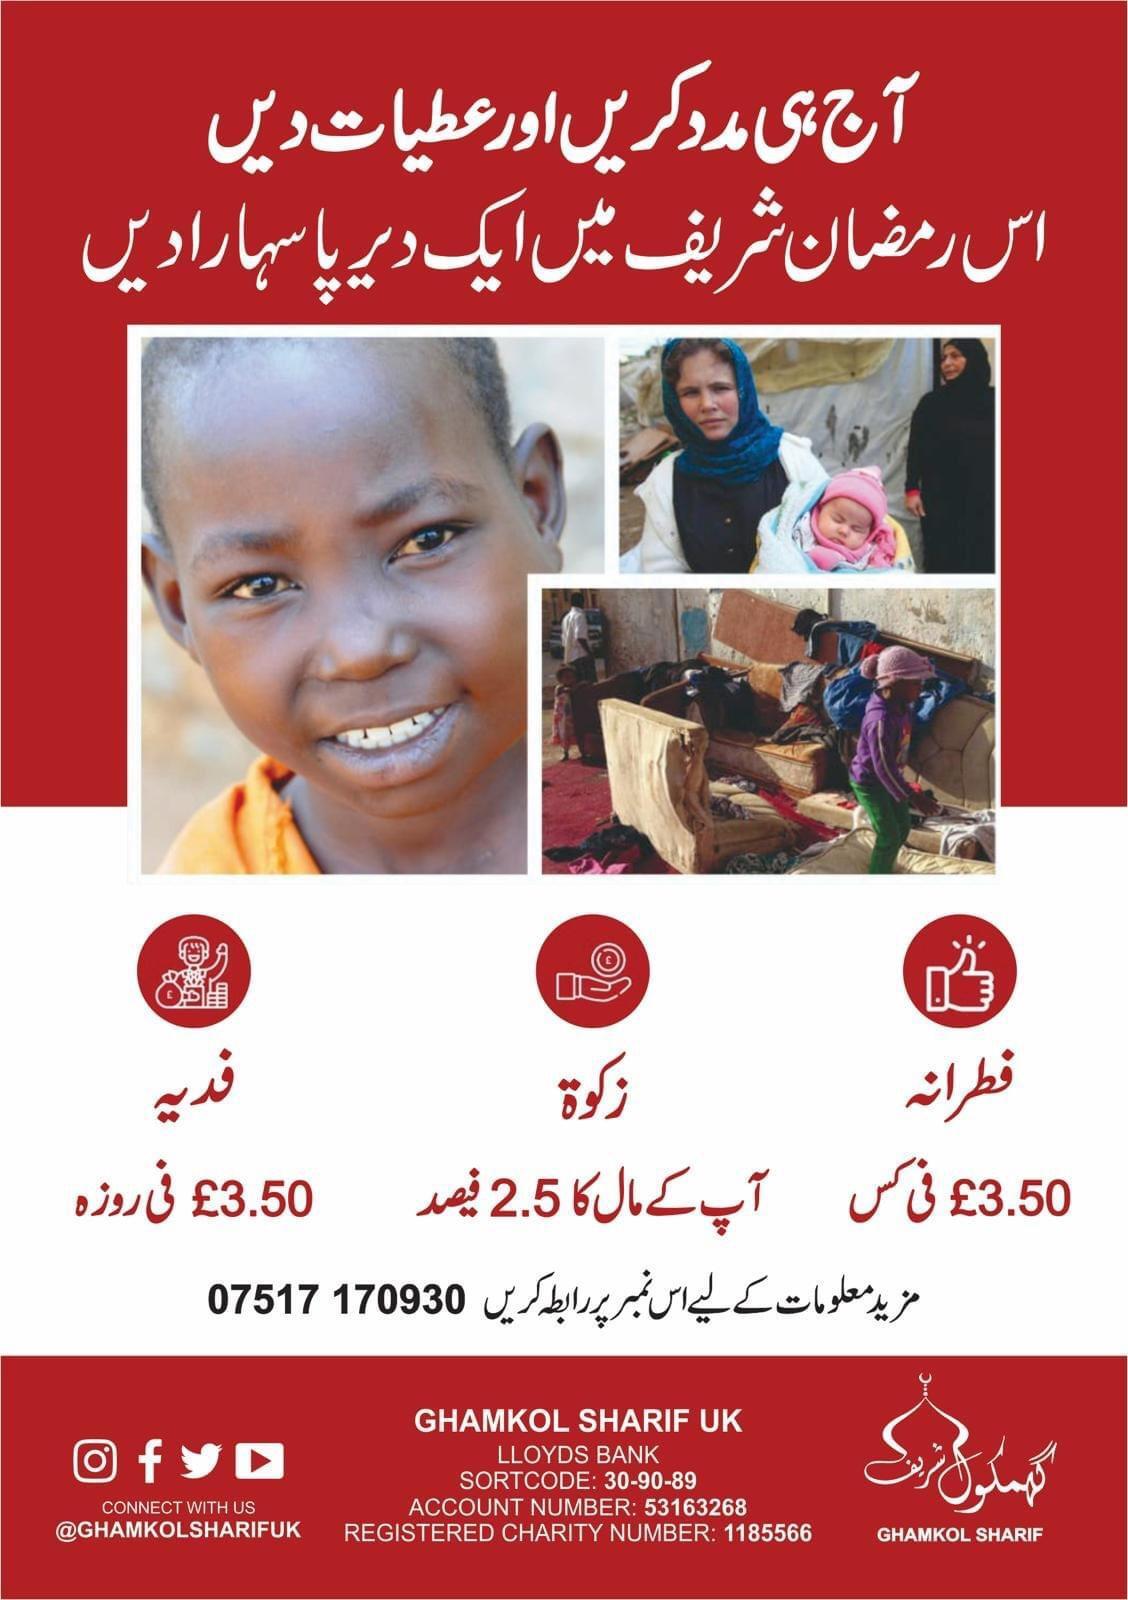 Urdu poster for Zakat, Fidya